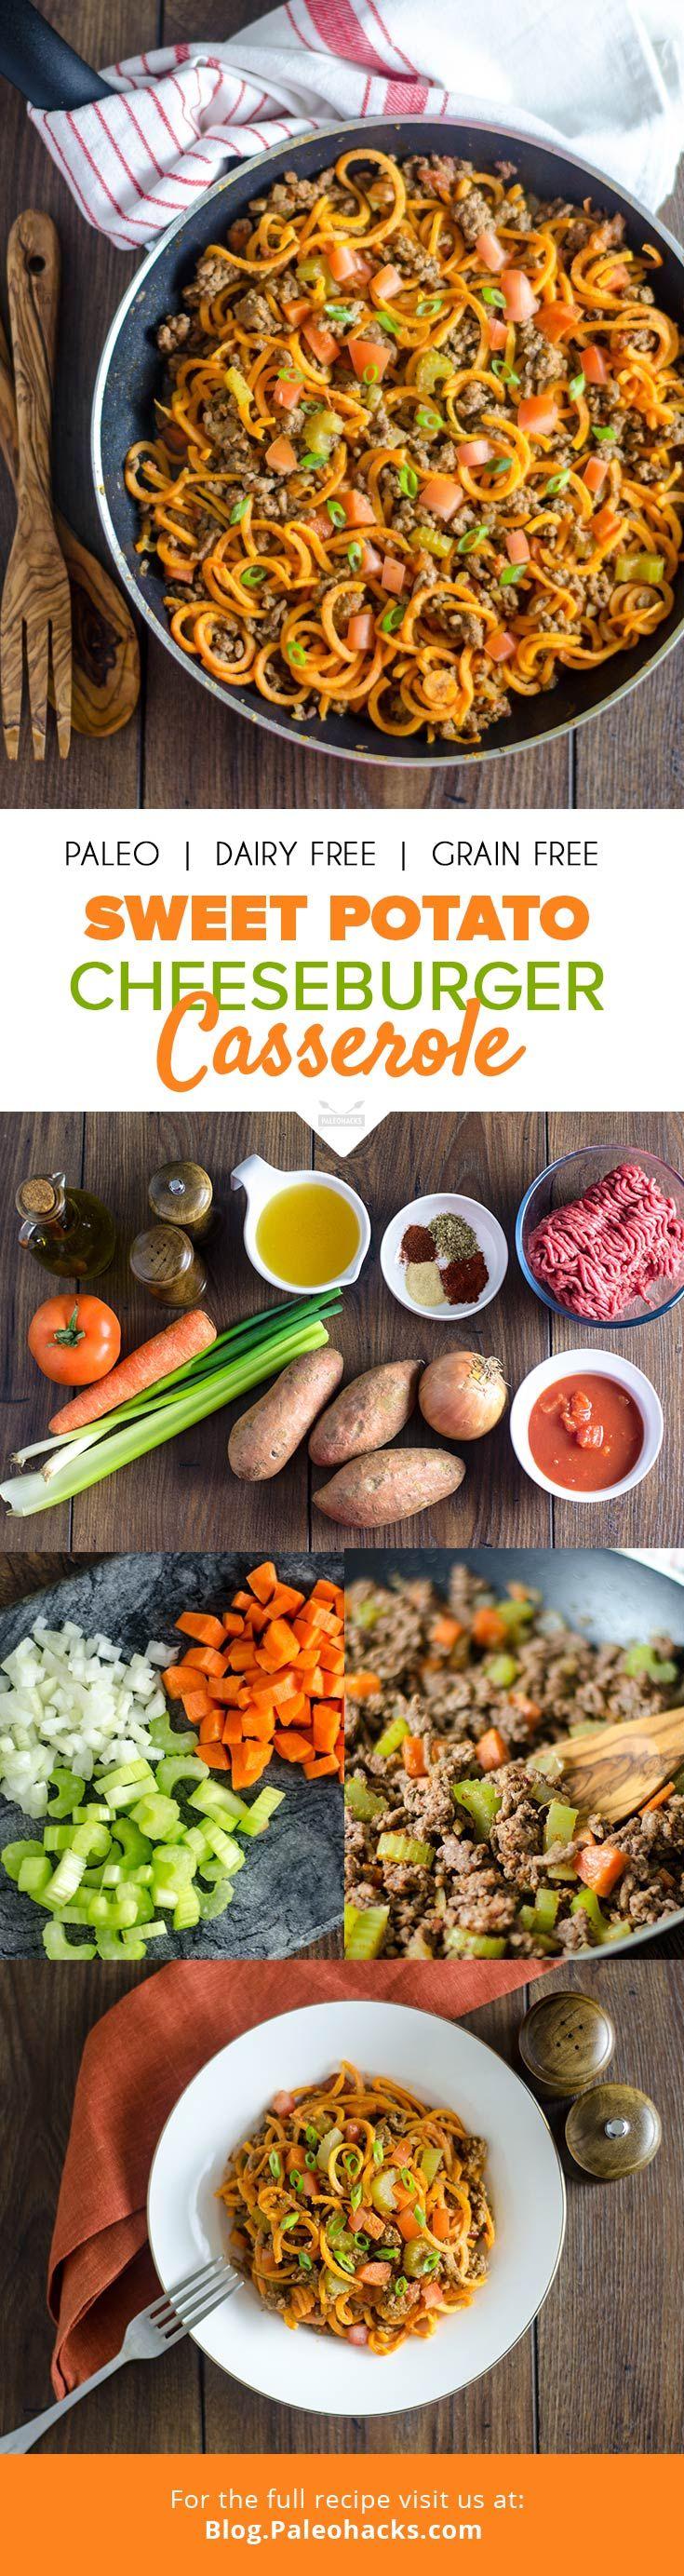 Sweet Potato Cheeseburger Casserole  Recipe  Paleo Diet -2561